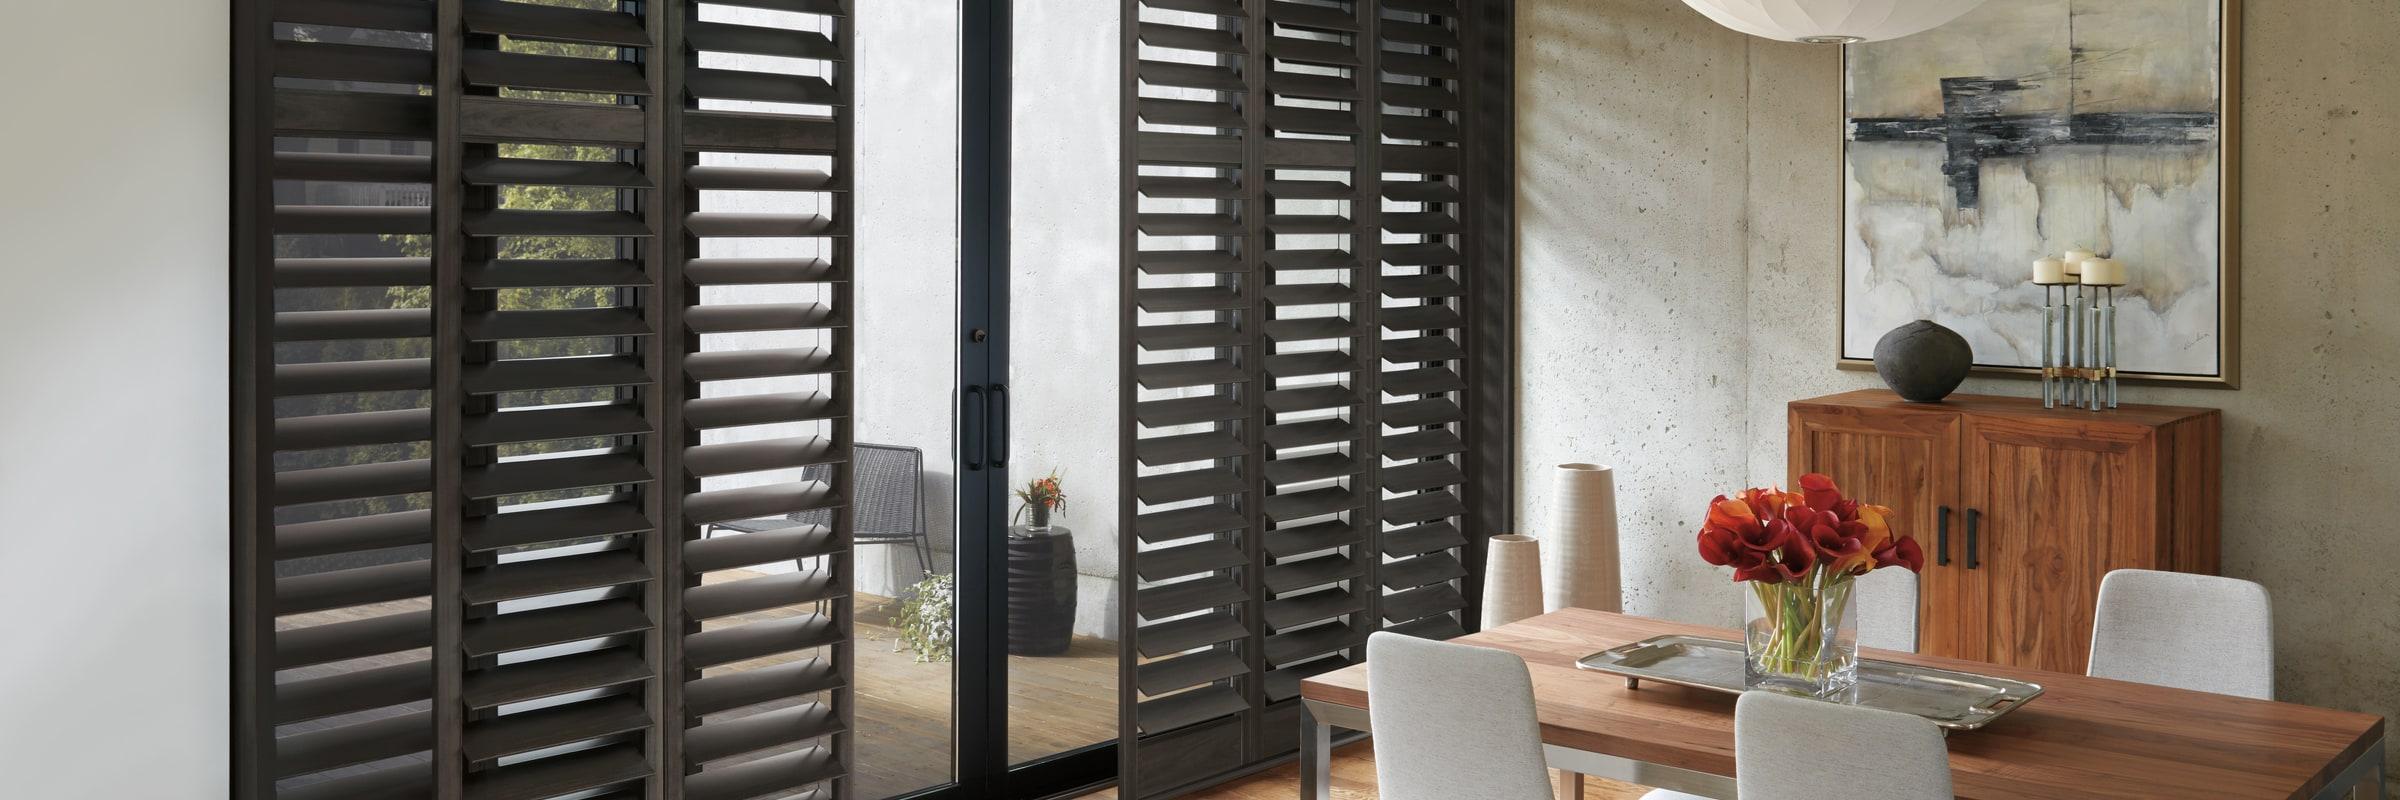 Hybrid interior shutters in Hybrid Urban Grey - NewStyle